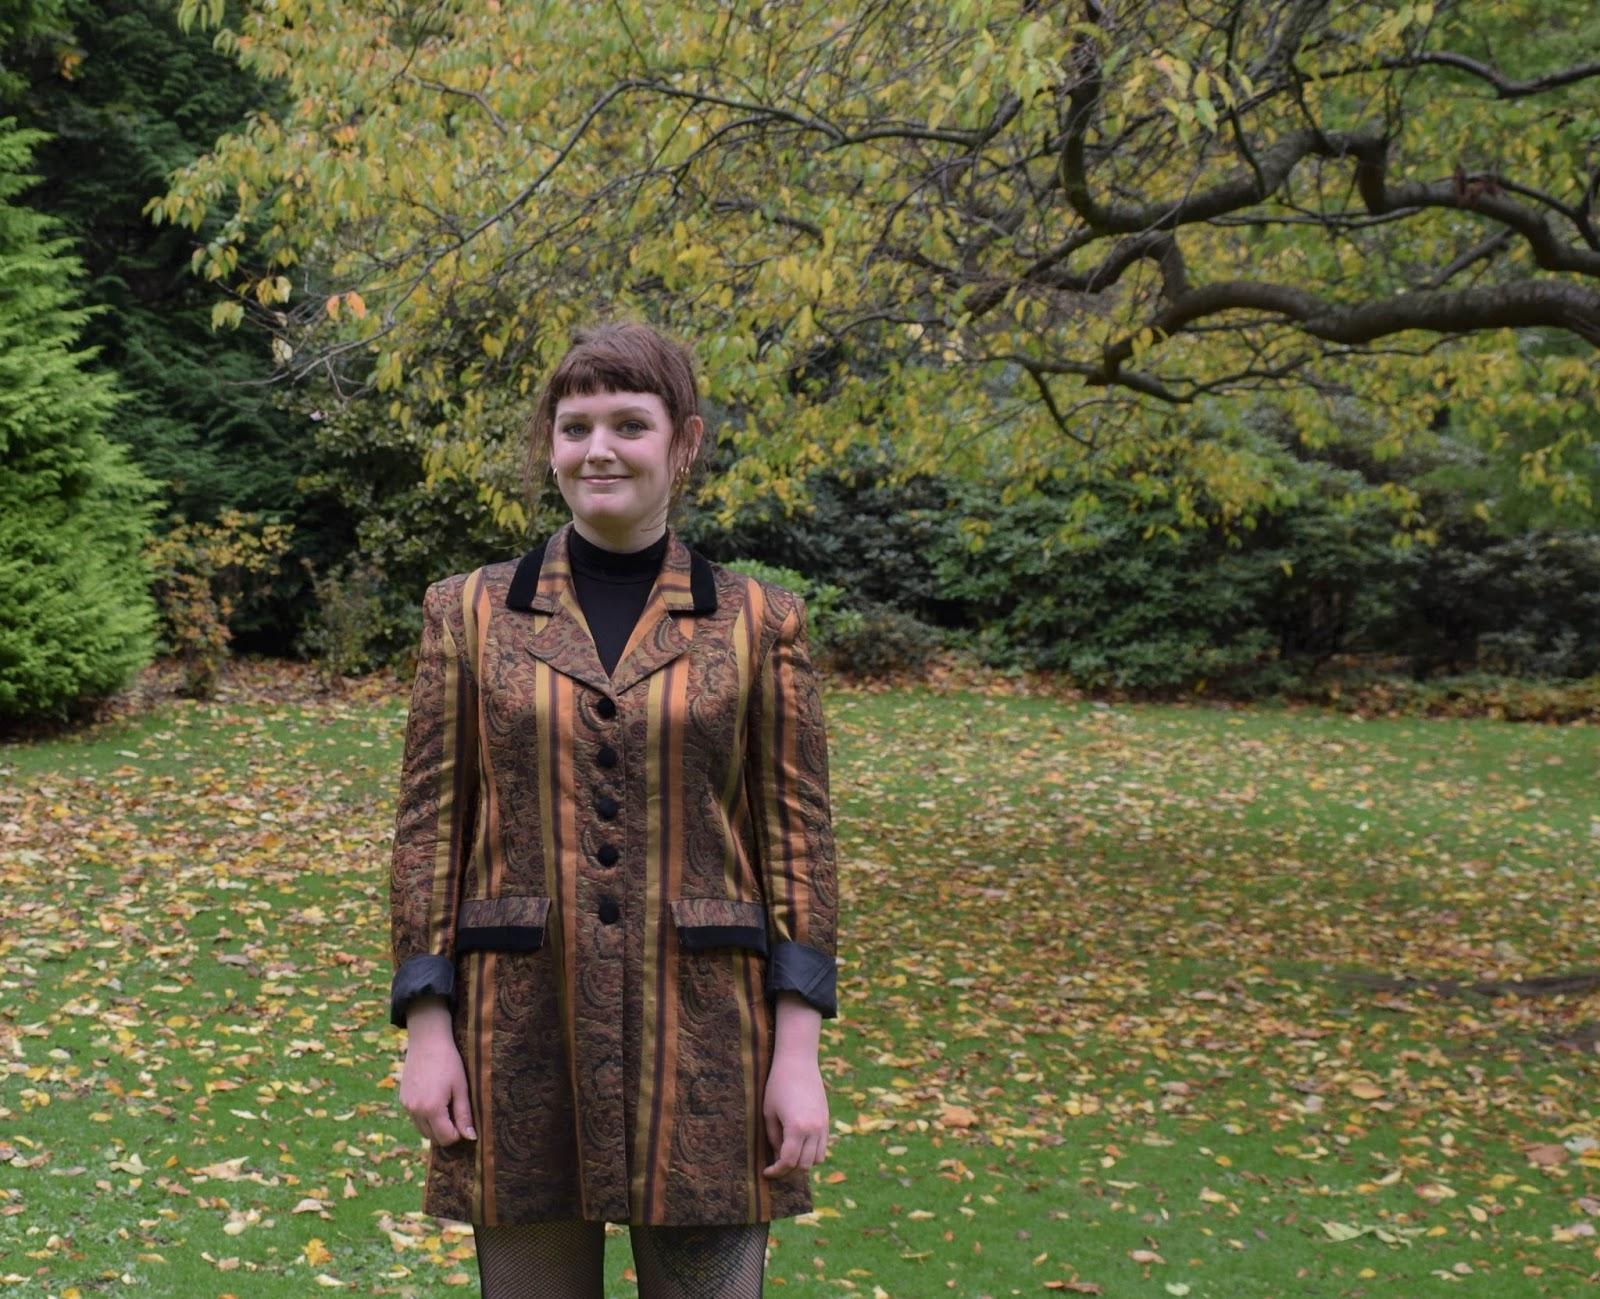 Scottish lifestyle blogger Lauren Aitchison from The Devil Wears Tartan wearing a vintage striped jacket from Rag Trade Vintage